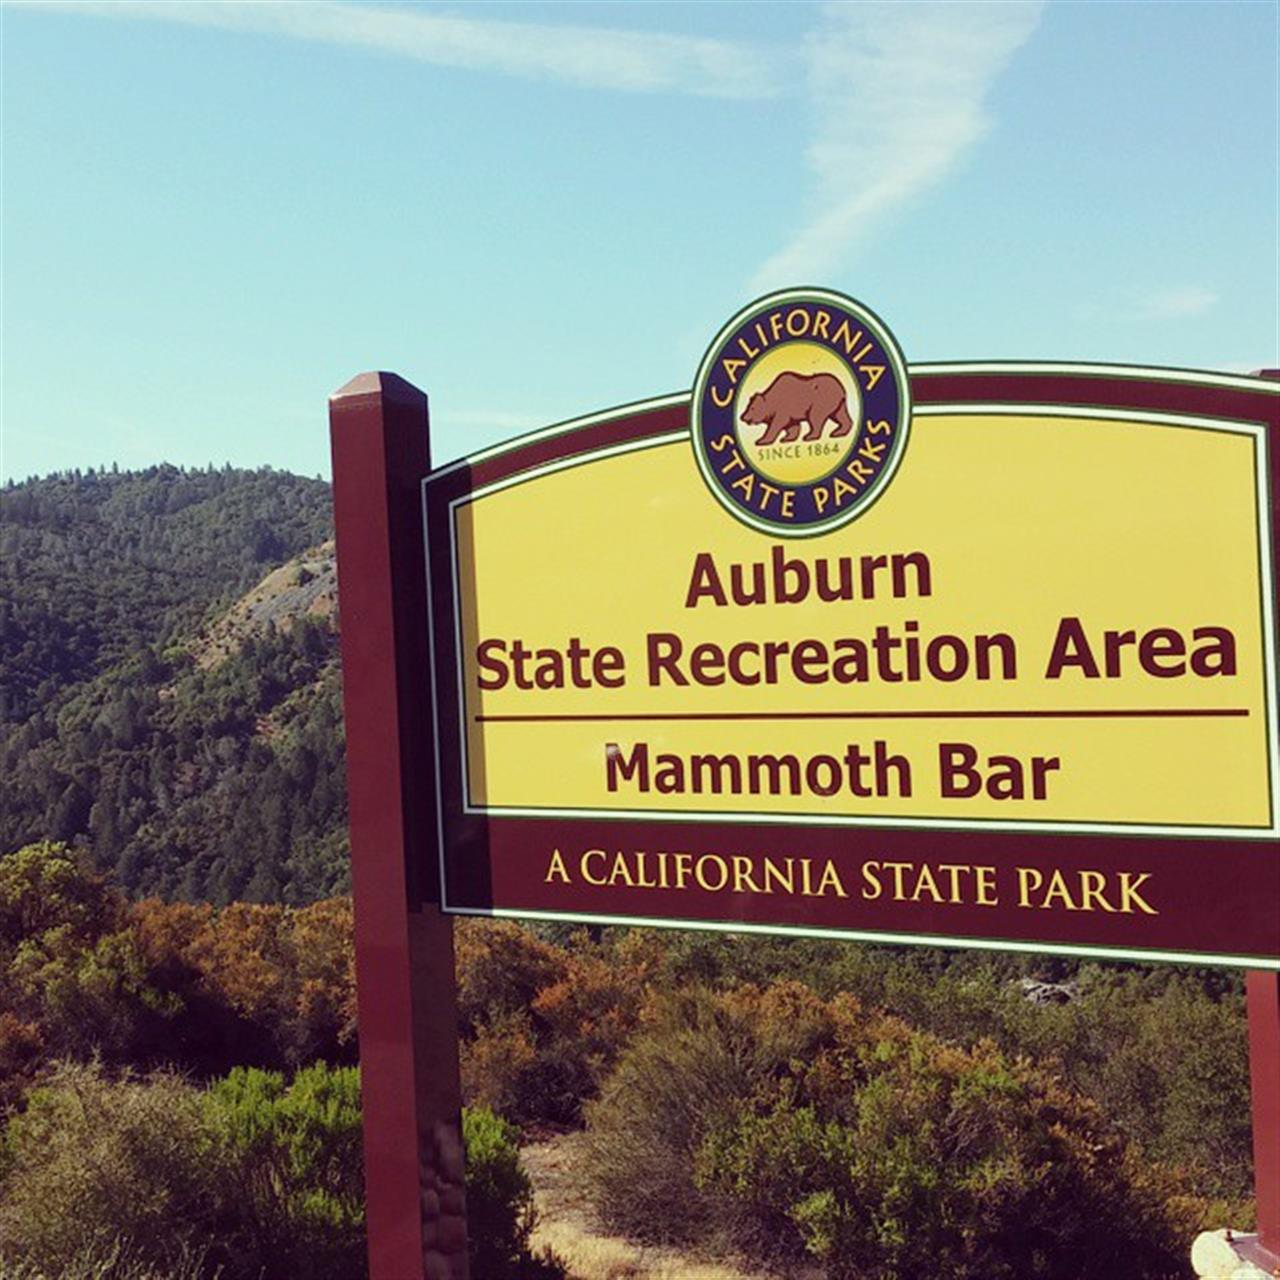 Auburn State Recreation Area, overlooking the canyon. #leadingrelocal #lyonrealestate #californiastatepark #placercounty #auburnstaterecreationarea